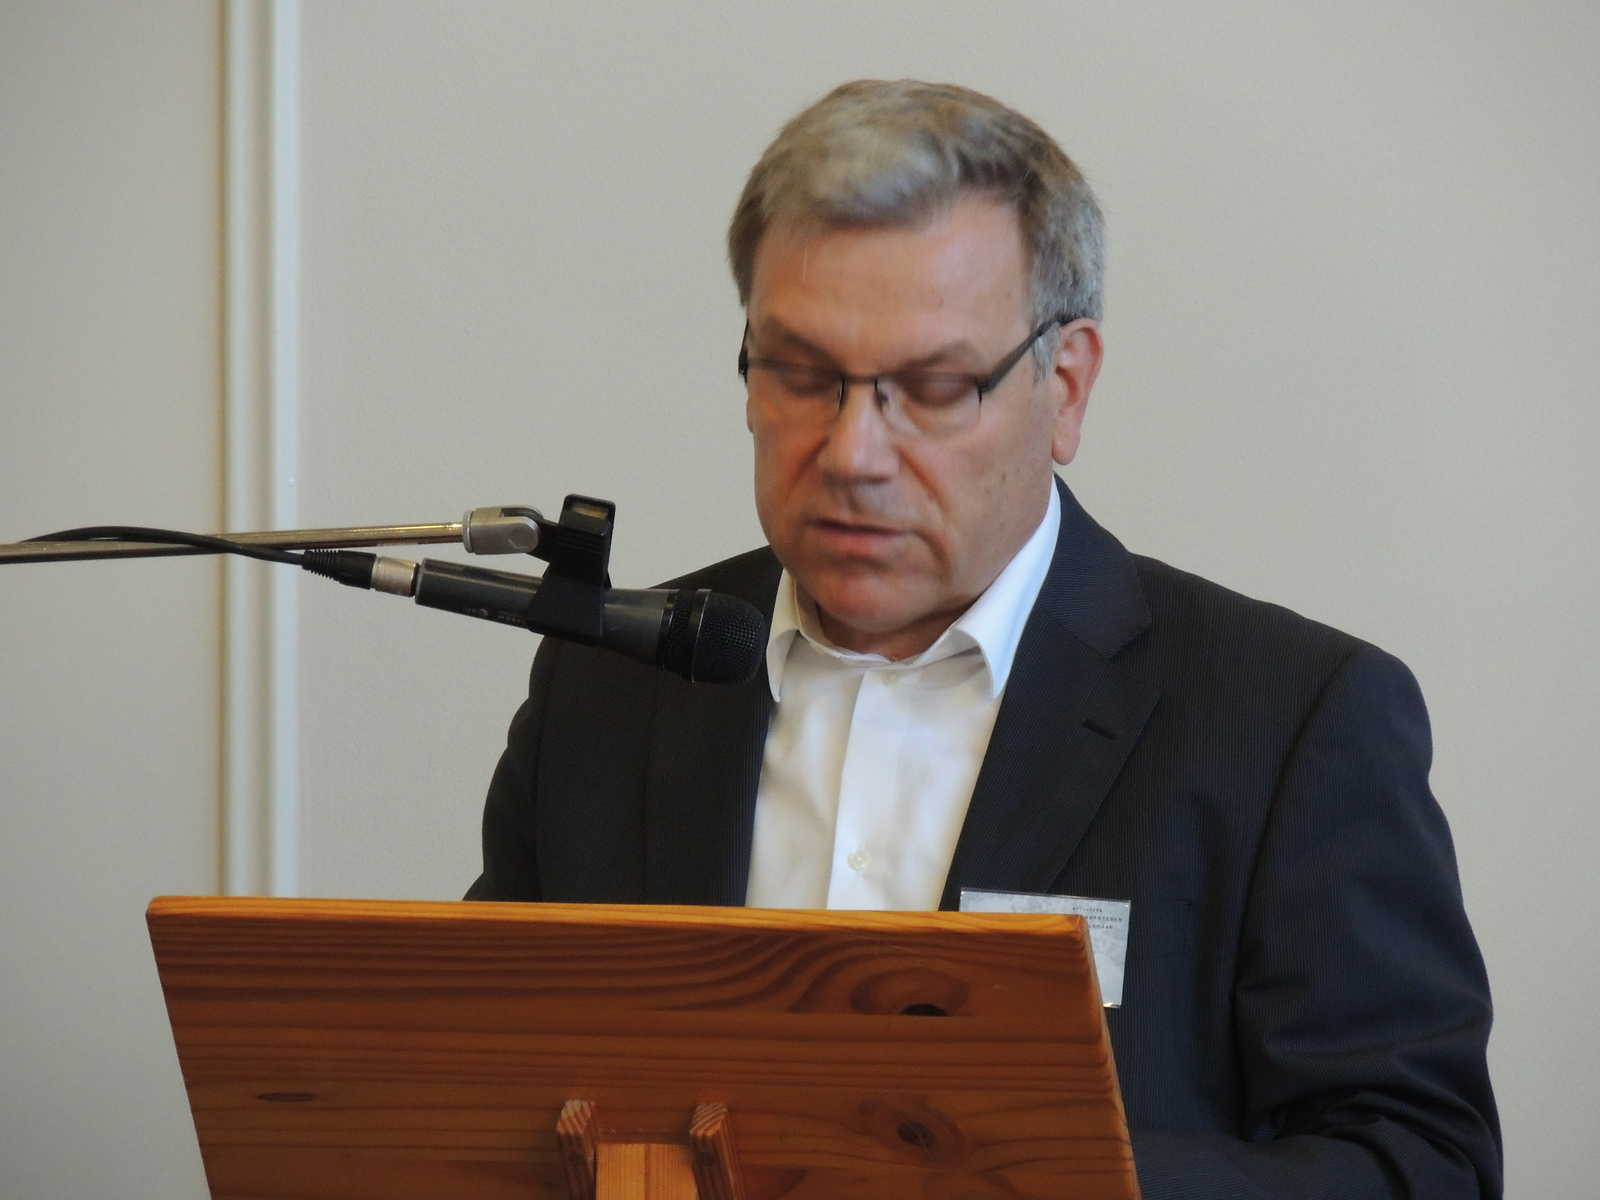 Paul Post, Regionaal Archief Alkmaar